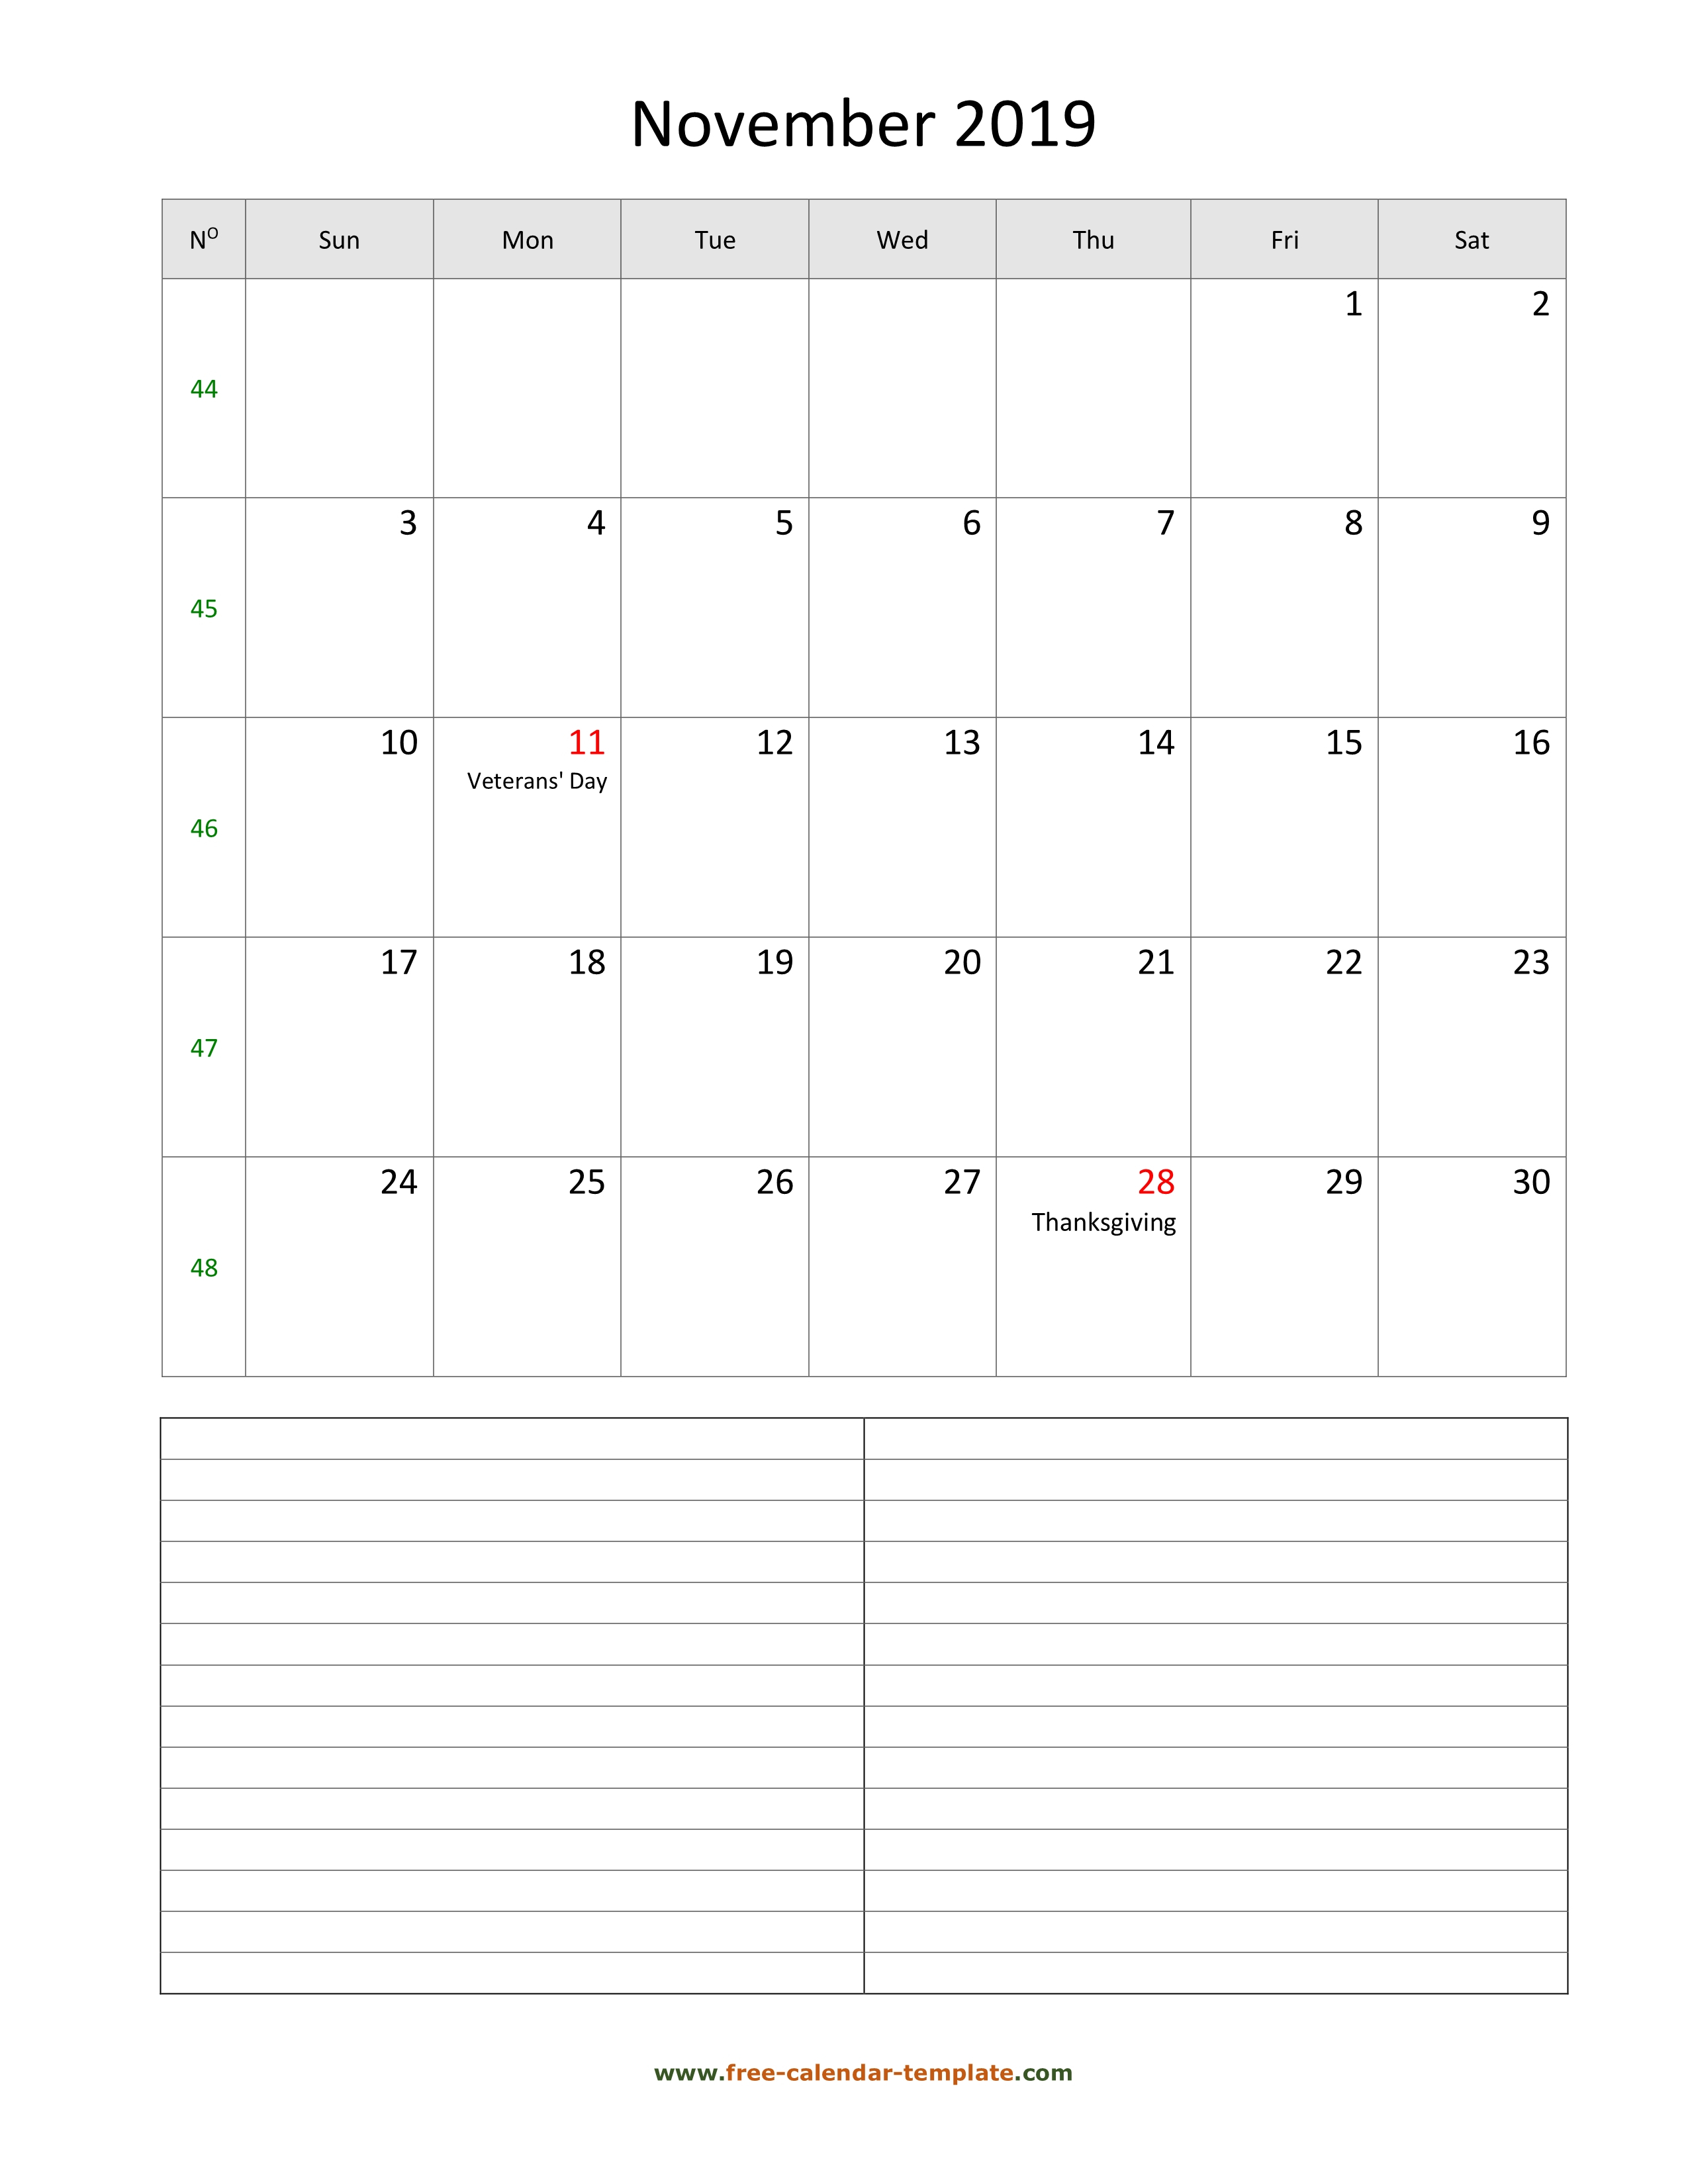 November 2019 Free Calendar Tempplate | Freecalendar throughout Free Printable Appointment Calendar